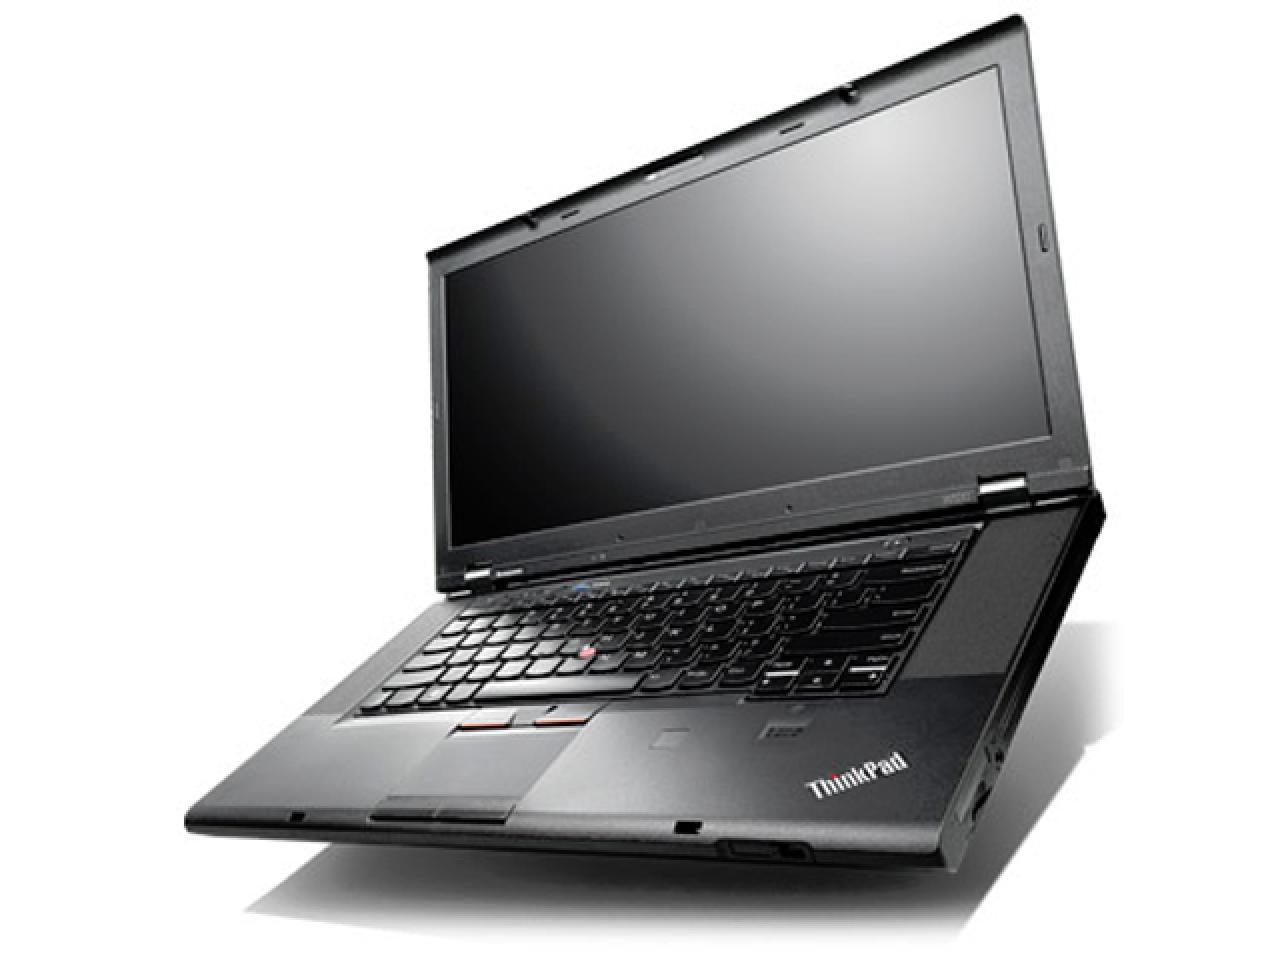 Lenovo Thinkpad W530  - shop.bb-net.de